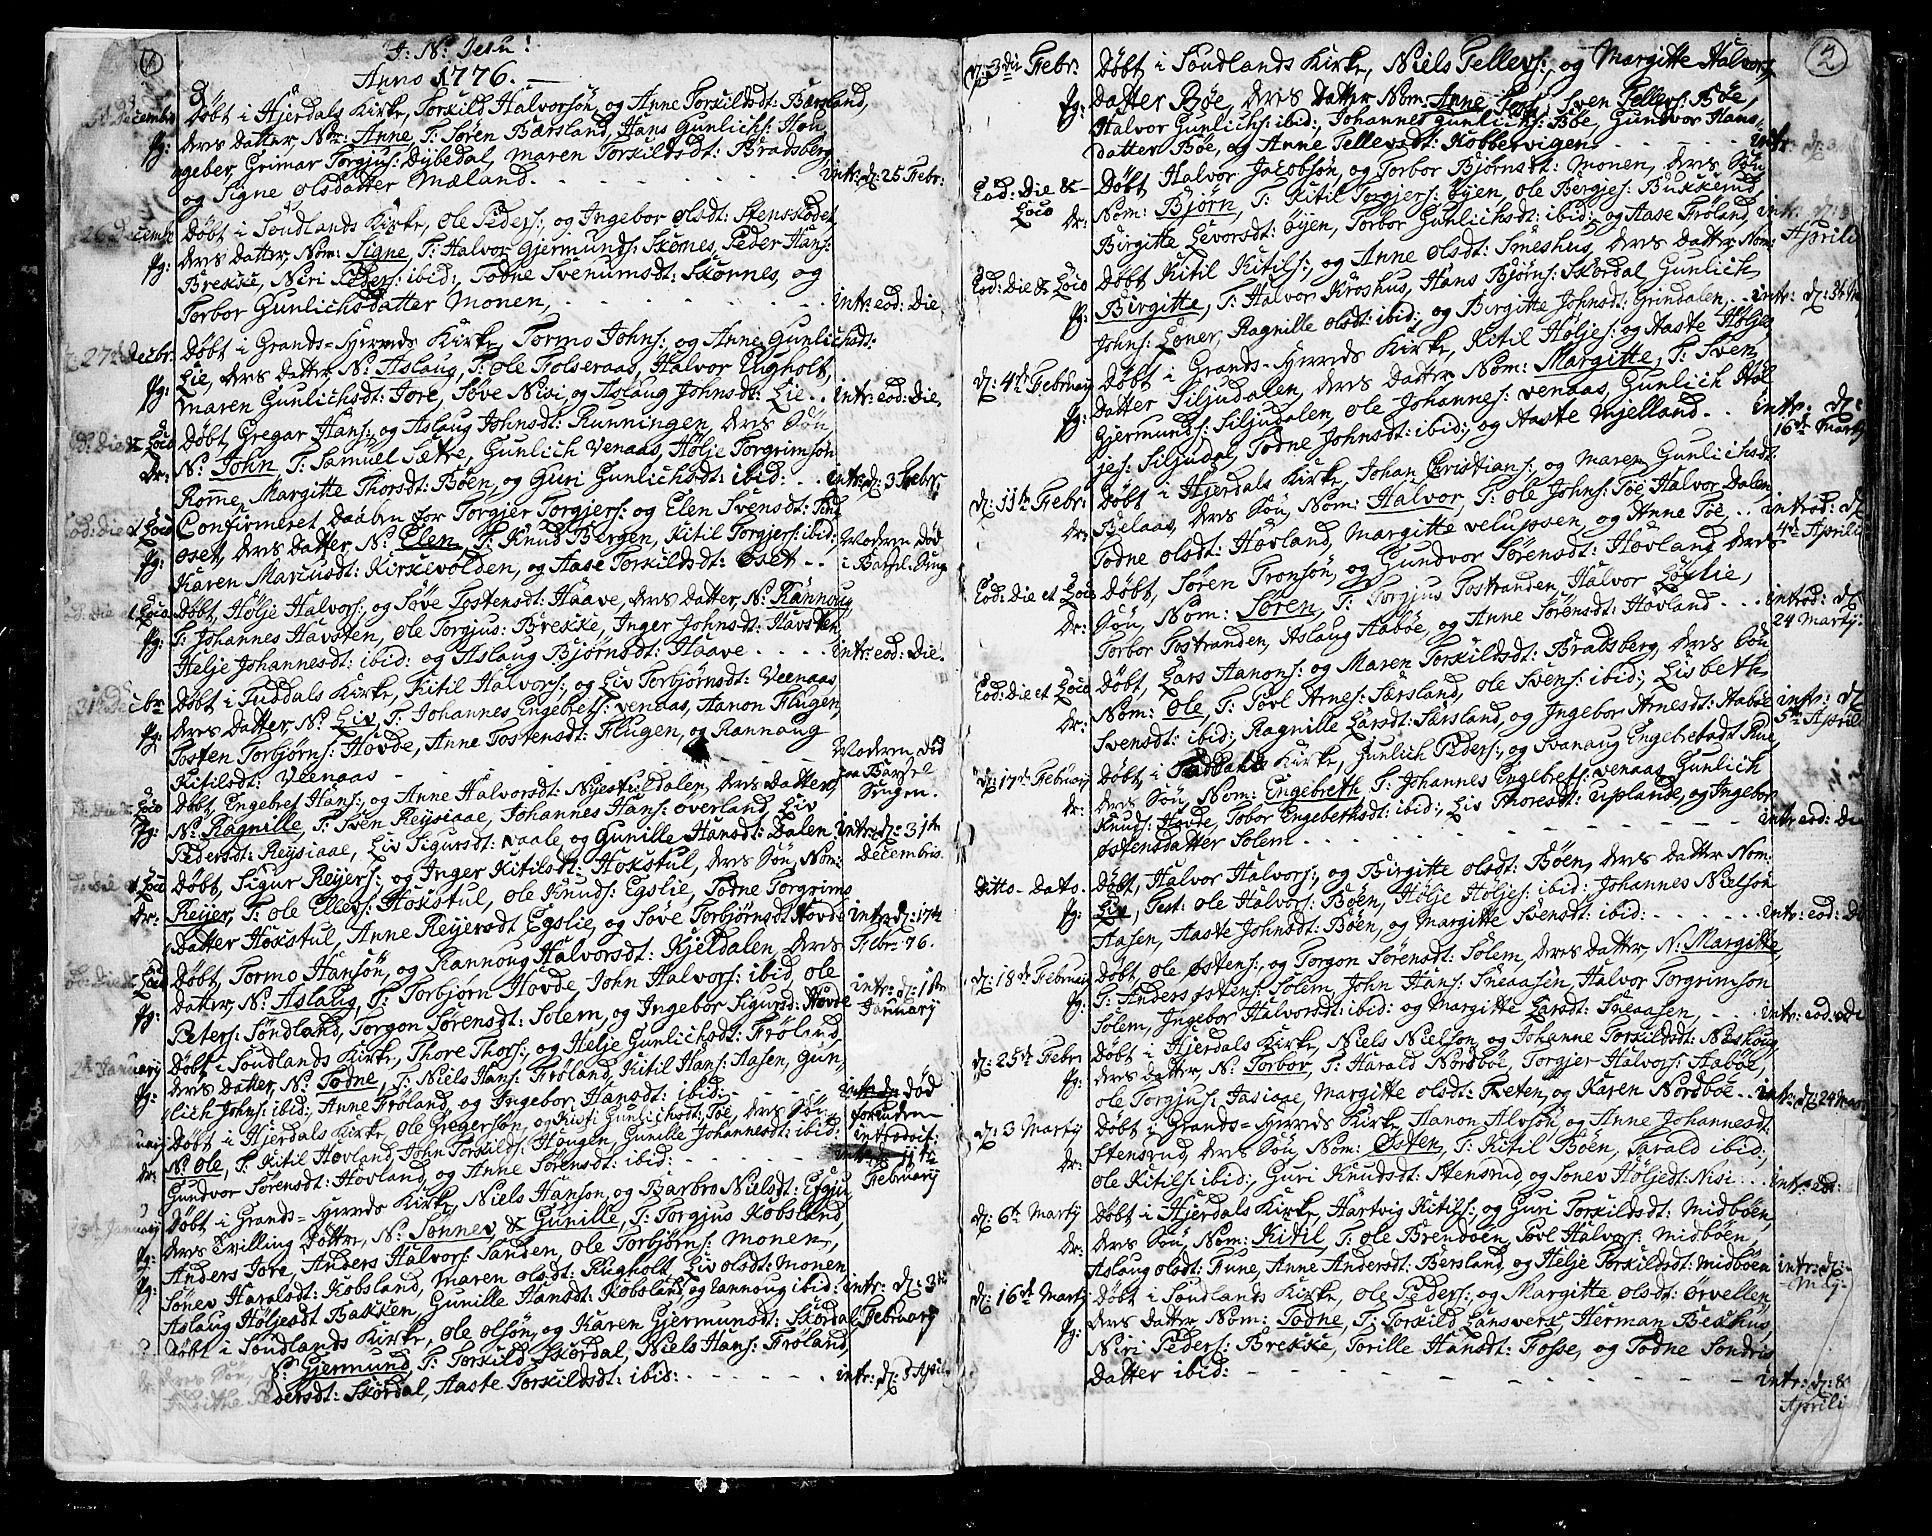 SAKO, Hjartdal kirkebøker, F/Fa/L0005: Ministerialbok nr. I 5, 1776-1801, s. 1-2